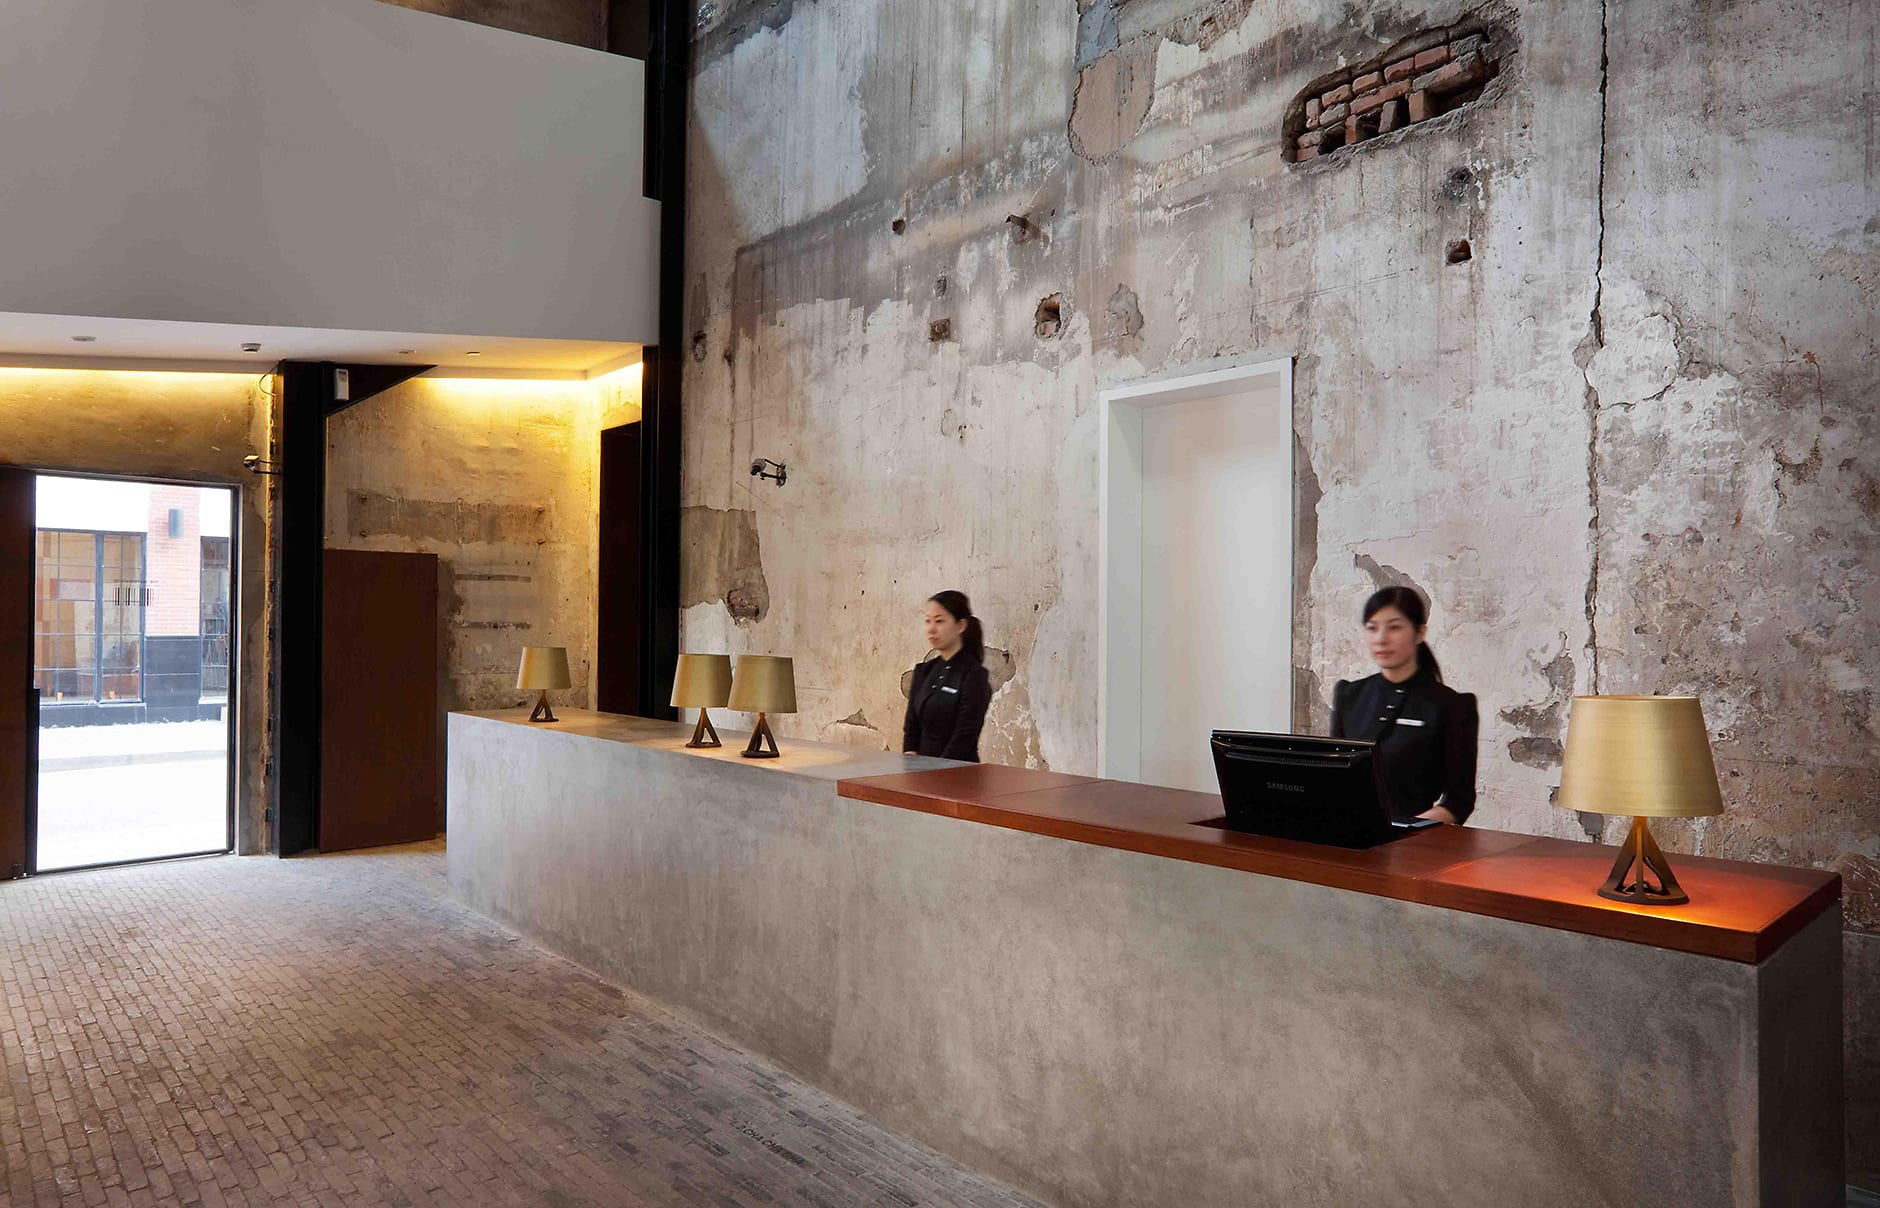 The Waterhouse at South Bund, Shanghai, China. © The Waterhouse at South Bund